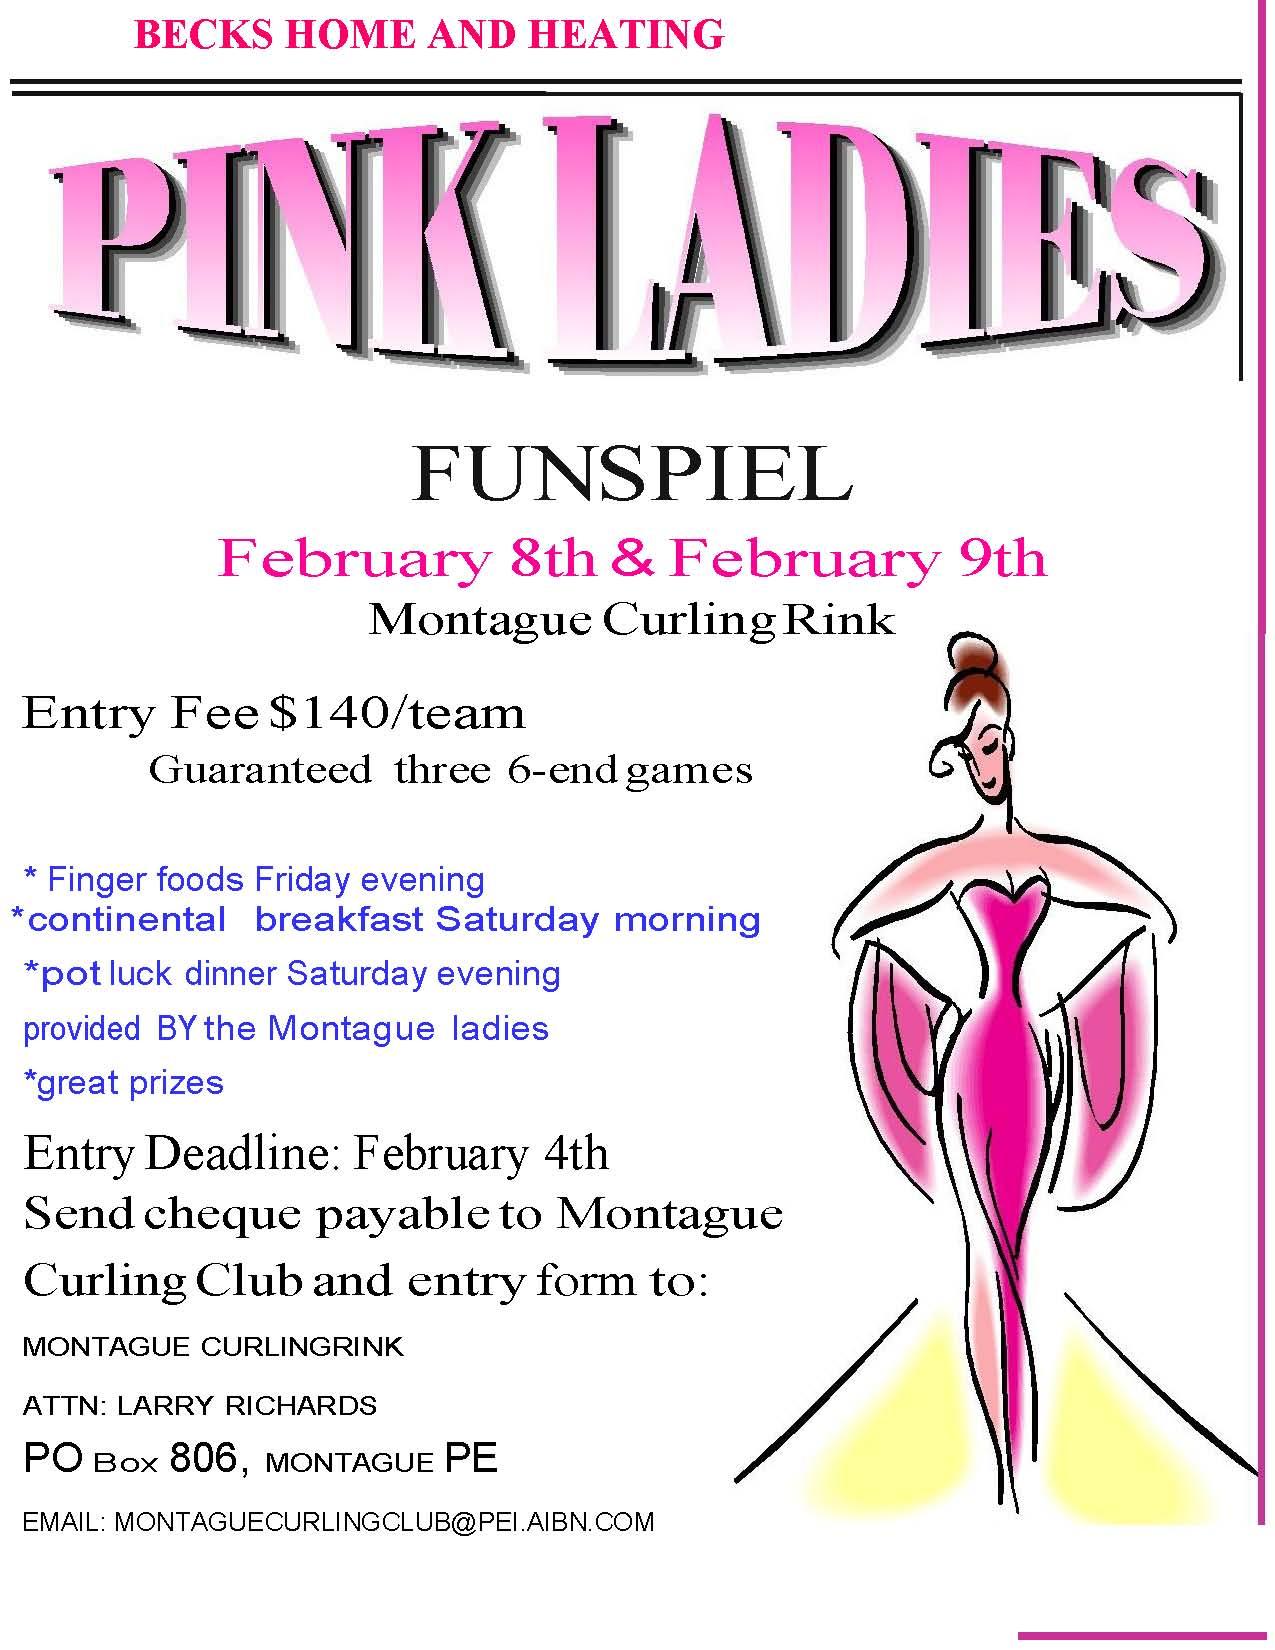 Pink Ladies Funspiel - Montague Curling Rink